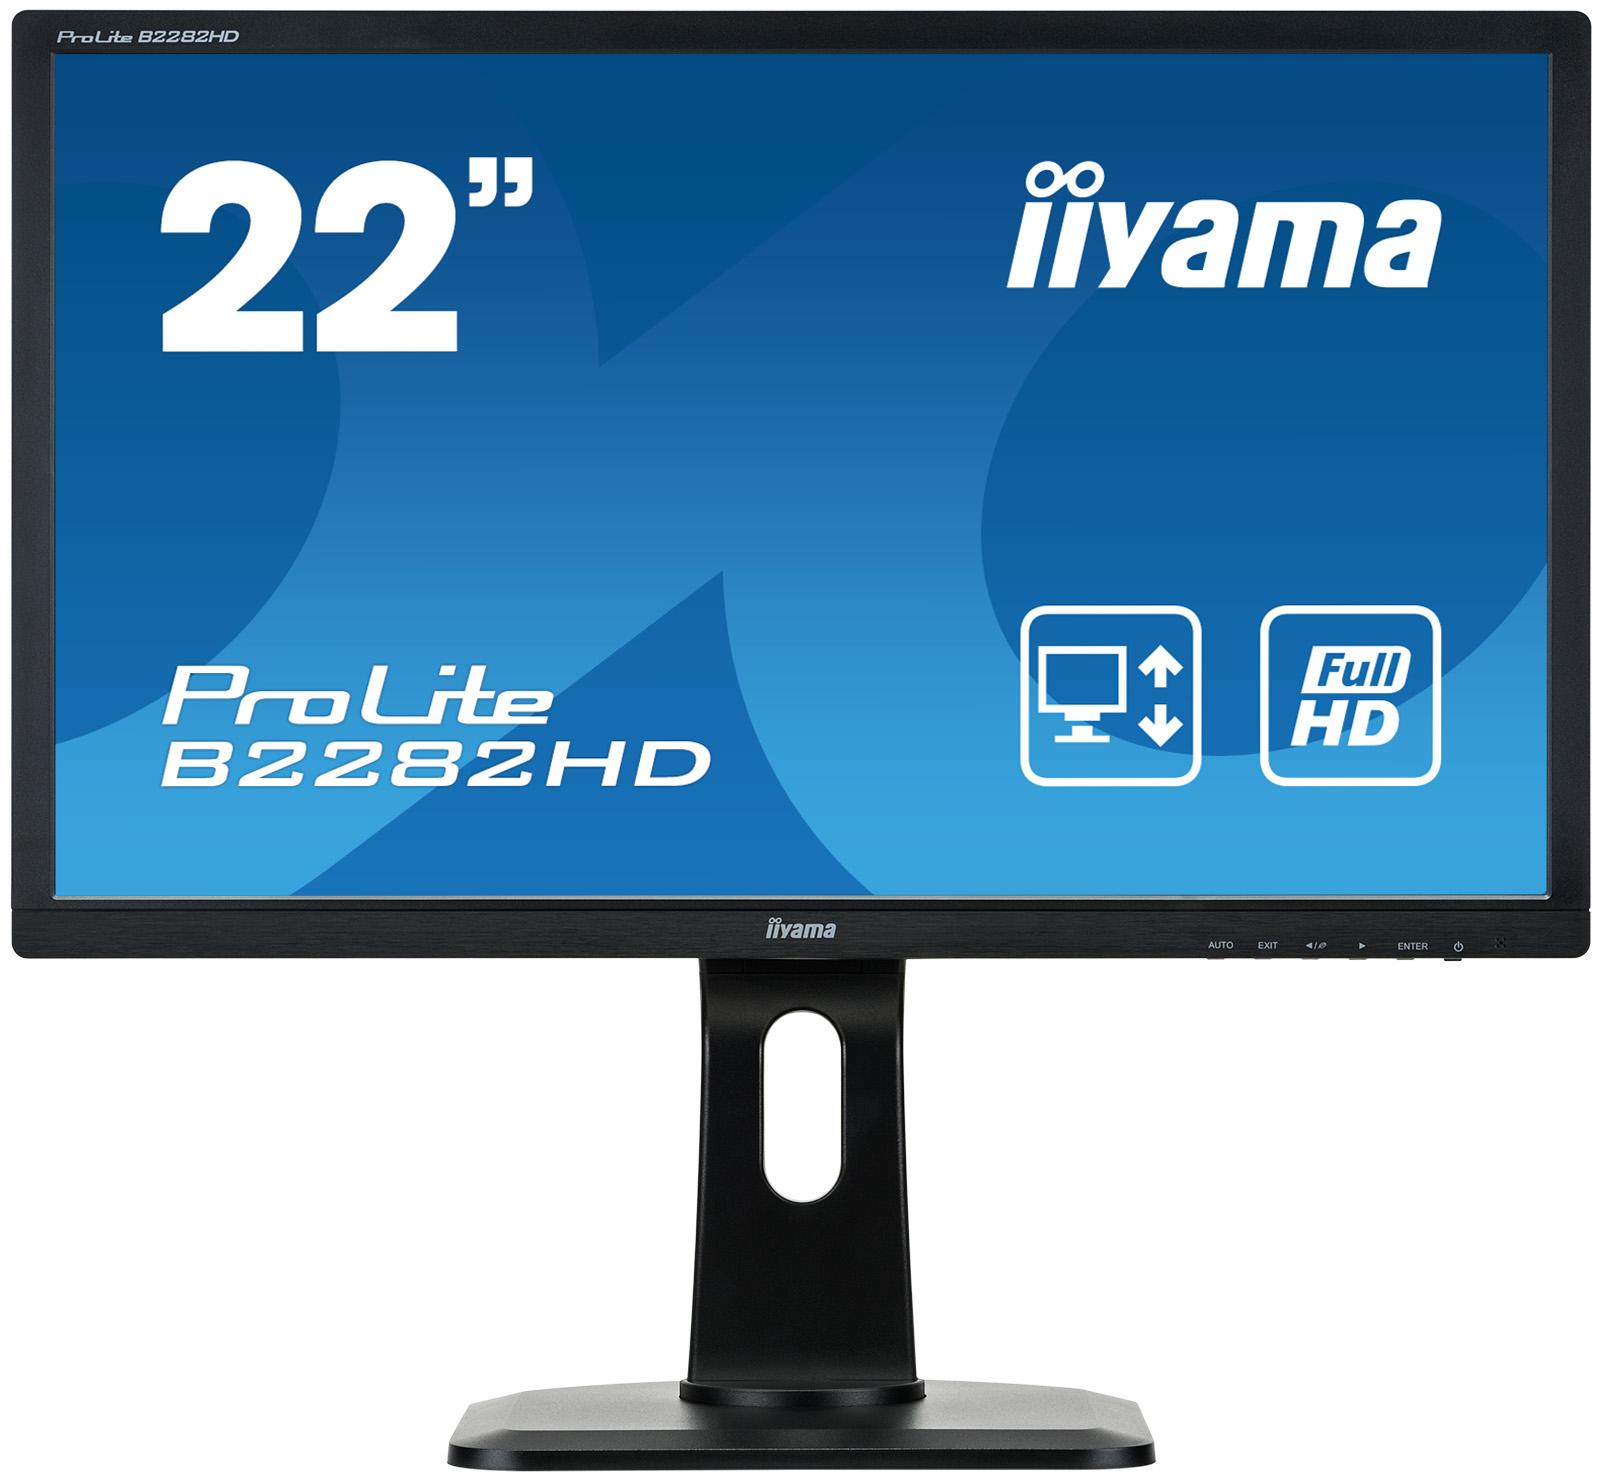 IIYAMA ProLite B2282HD-B1 54,7cm 21,5Zoll TN LED Backlight Full HD 1920x1080 VGA DVI hoehenverstellbar Pivot schwarz